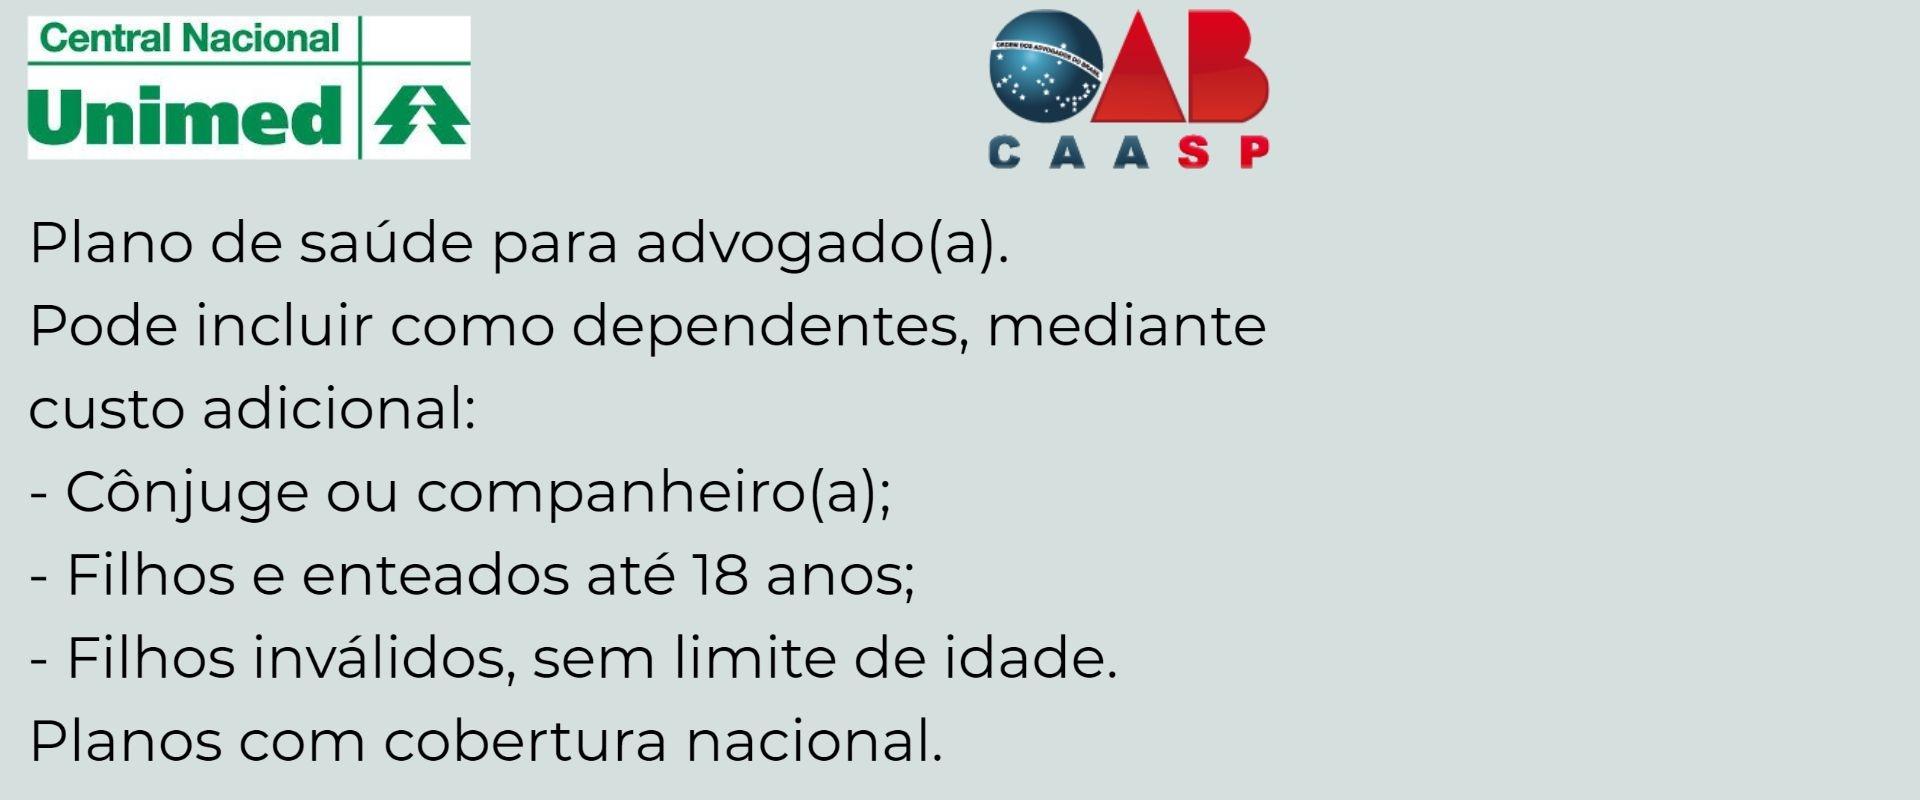 Unimed CAASP Ferraz de Vasconcelos